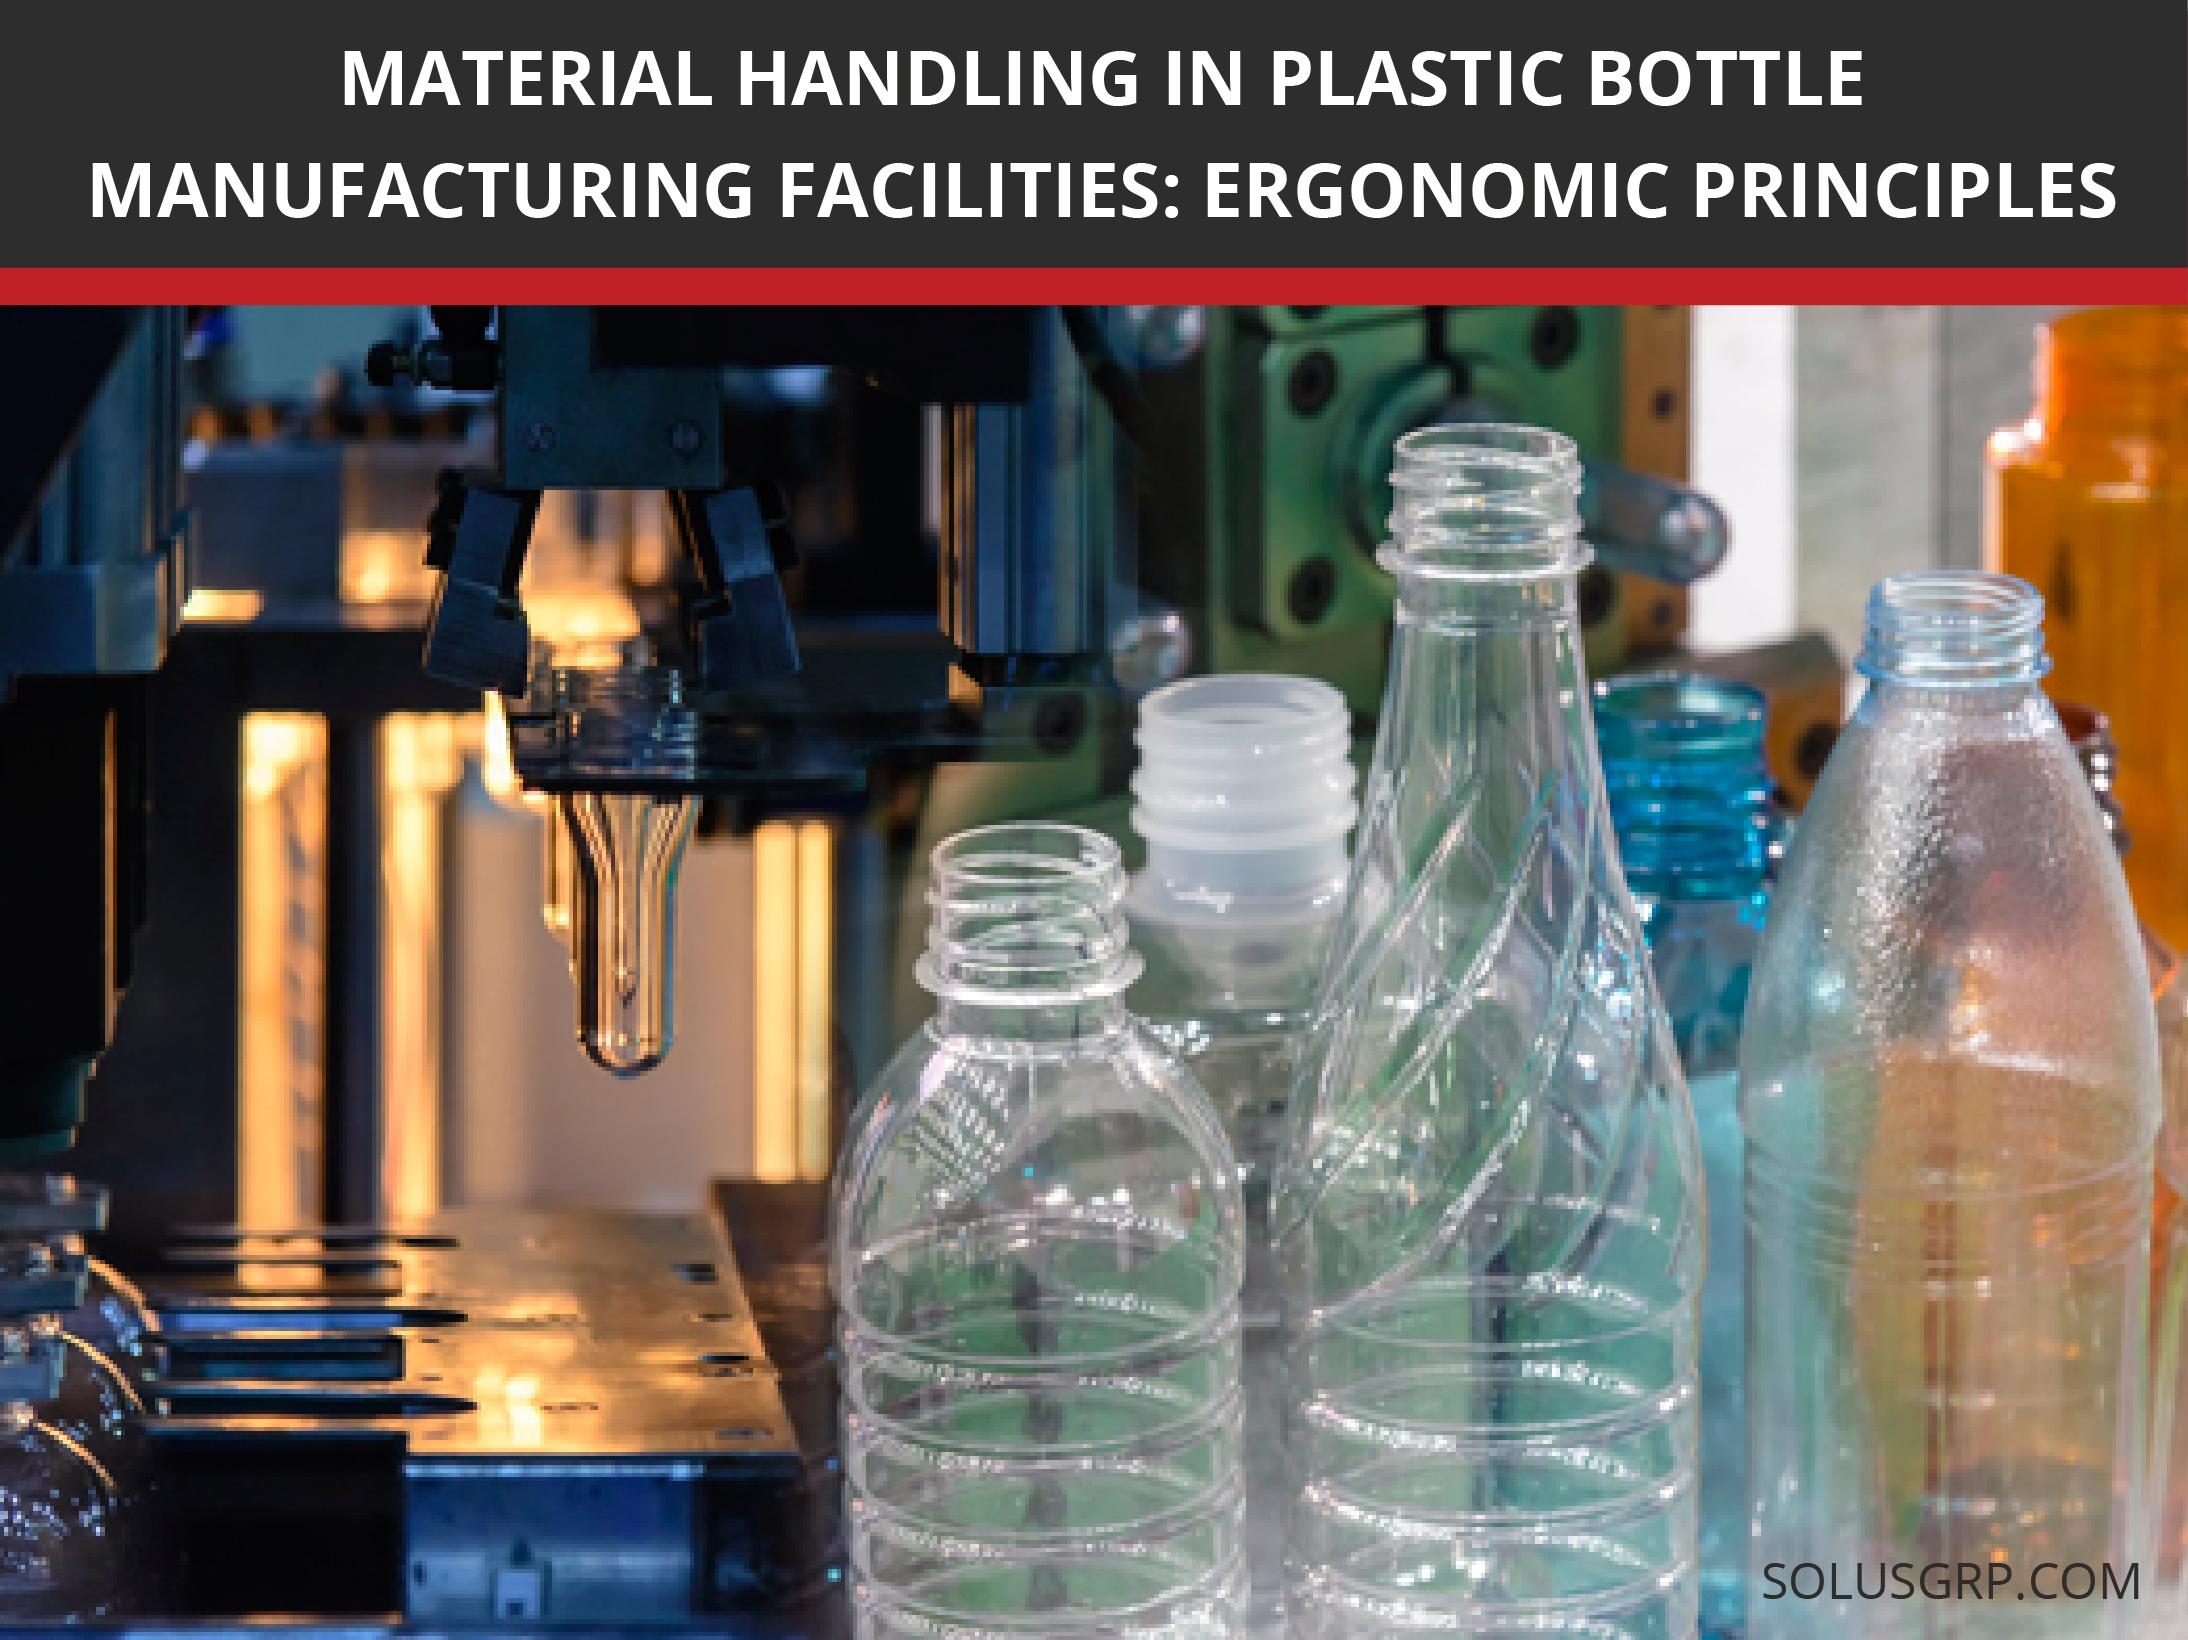 Ergonomics of Material Handling in Plastic Bottle Manufacturing Facilities